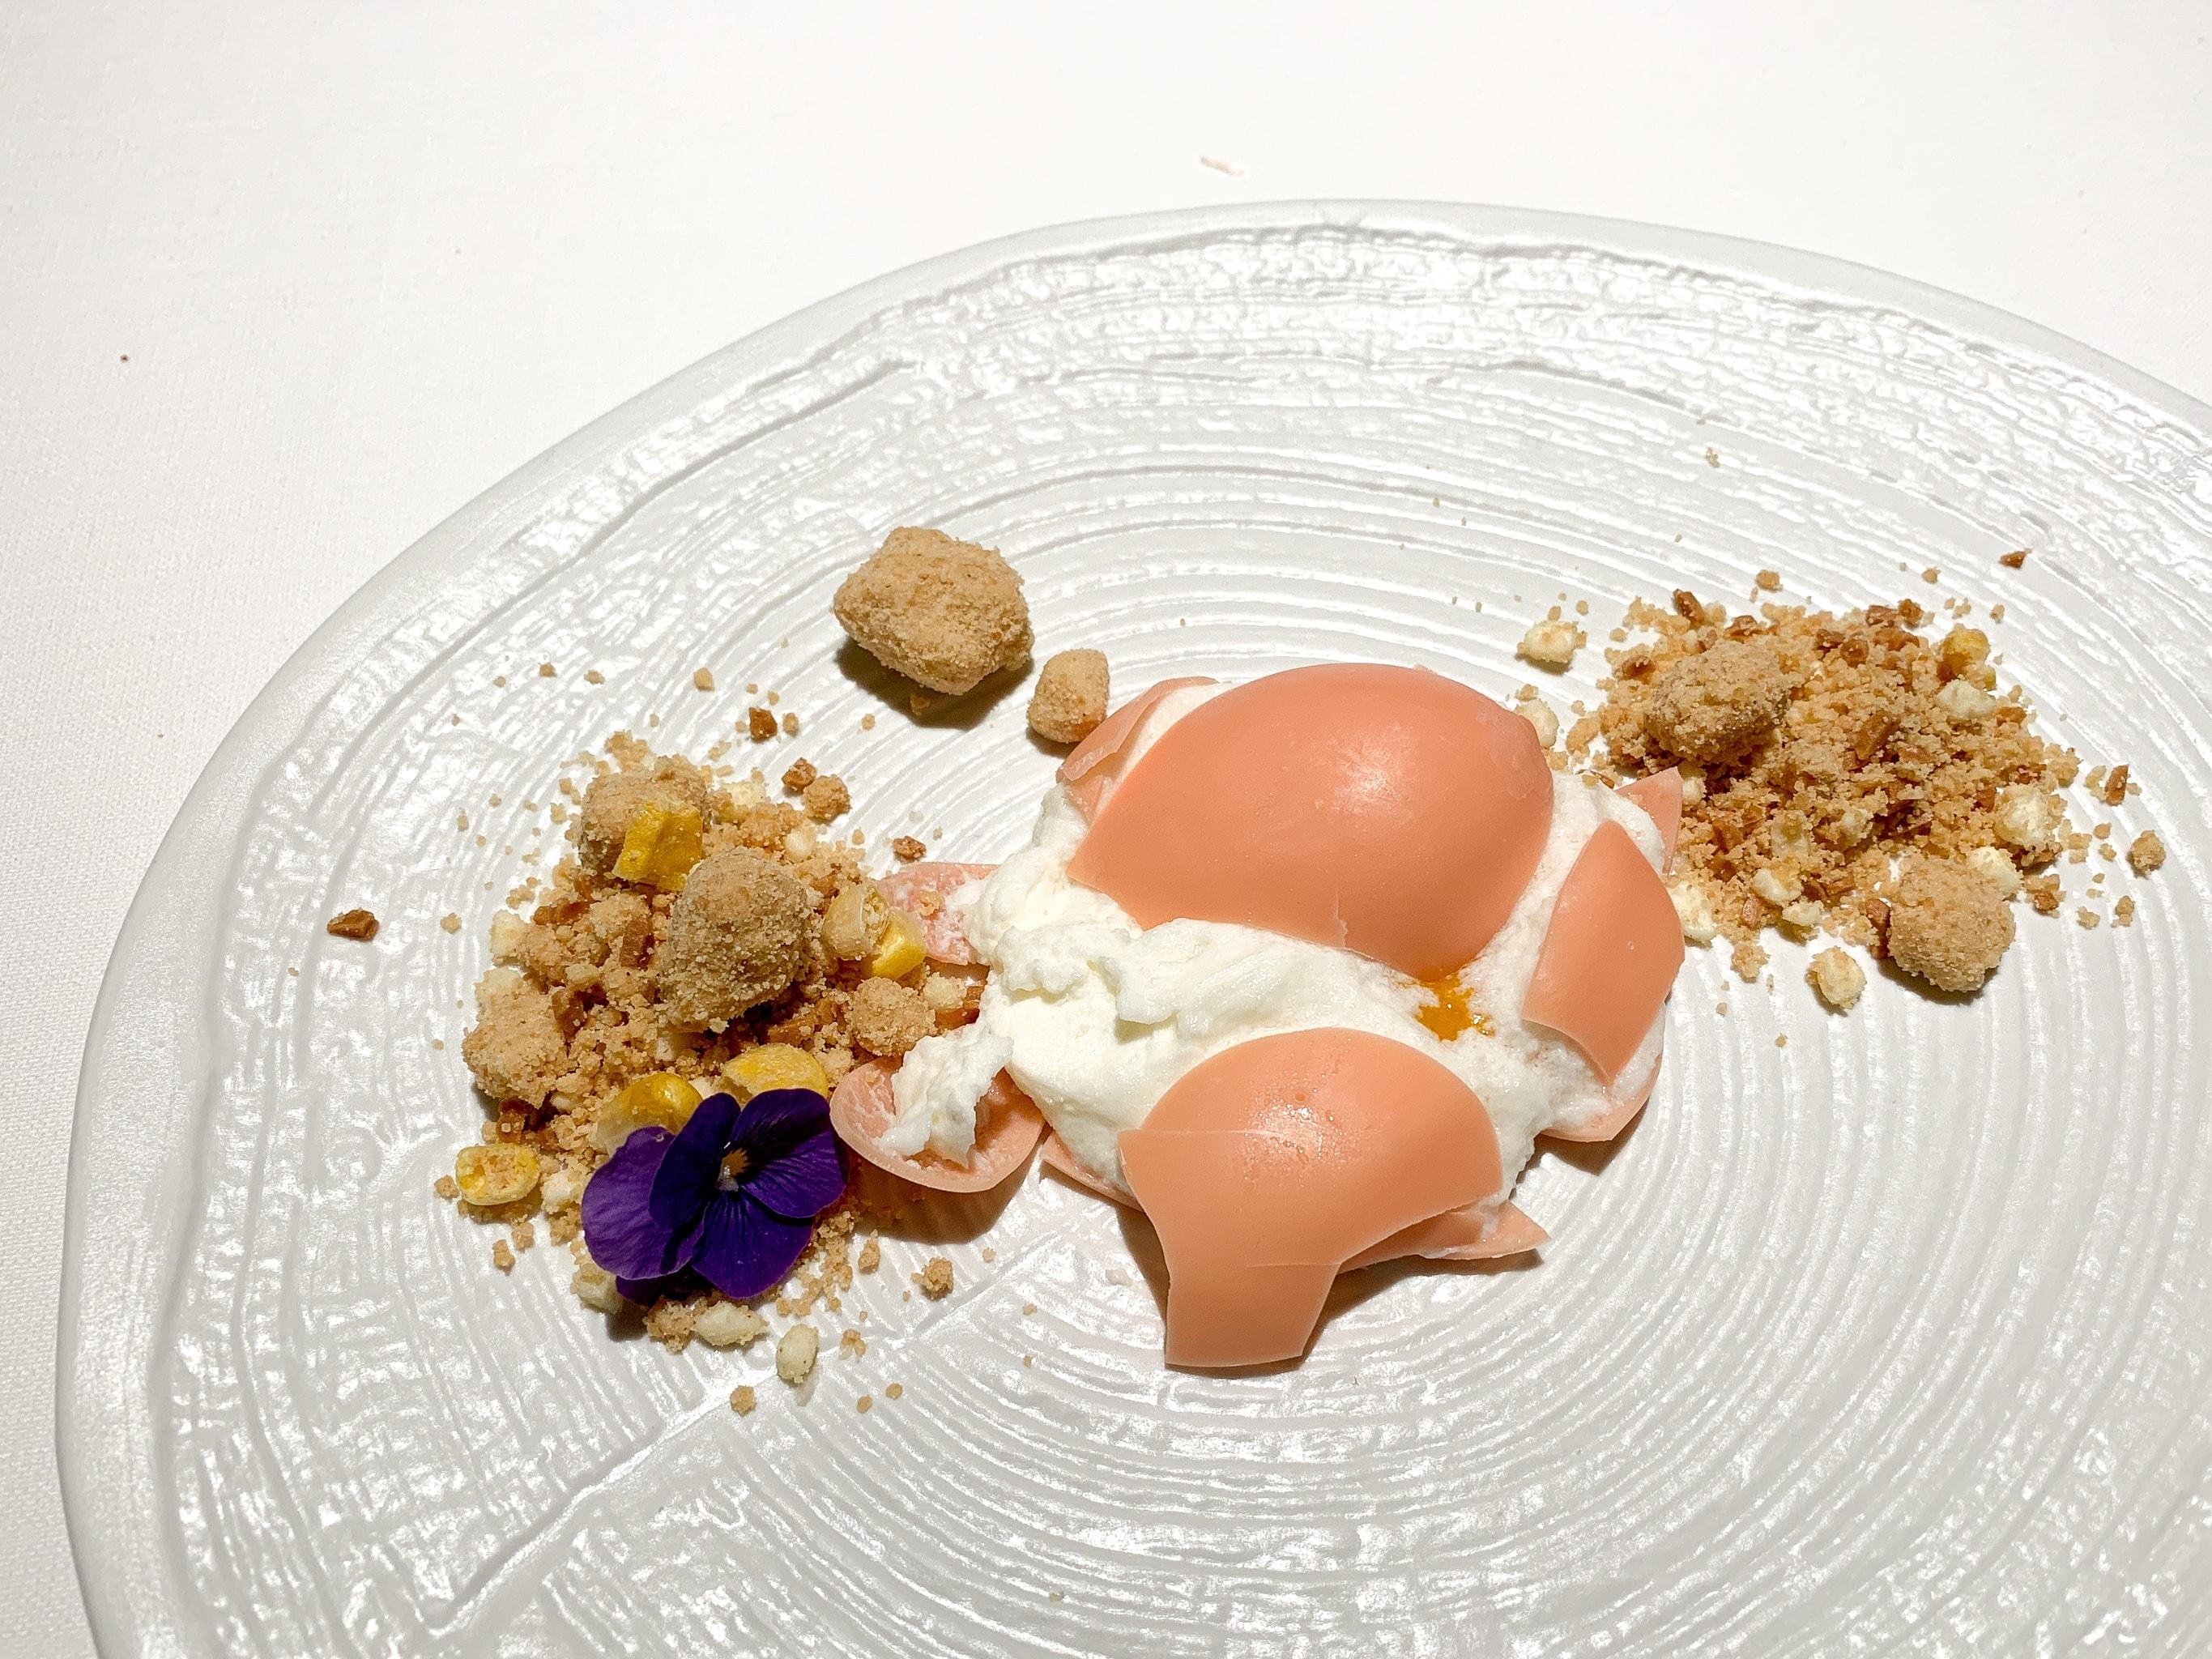 Scrambled egg made of yogurt, mango, and white chocolate